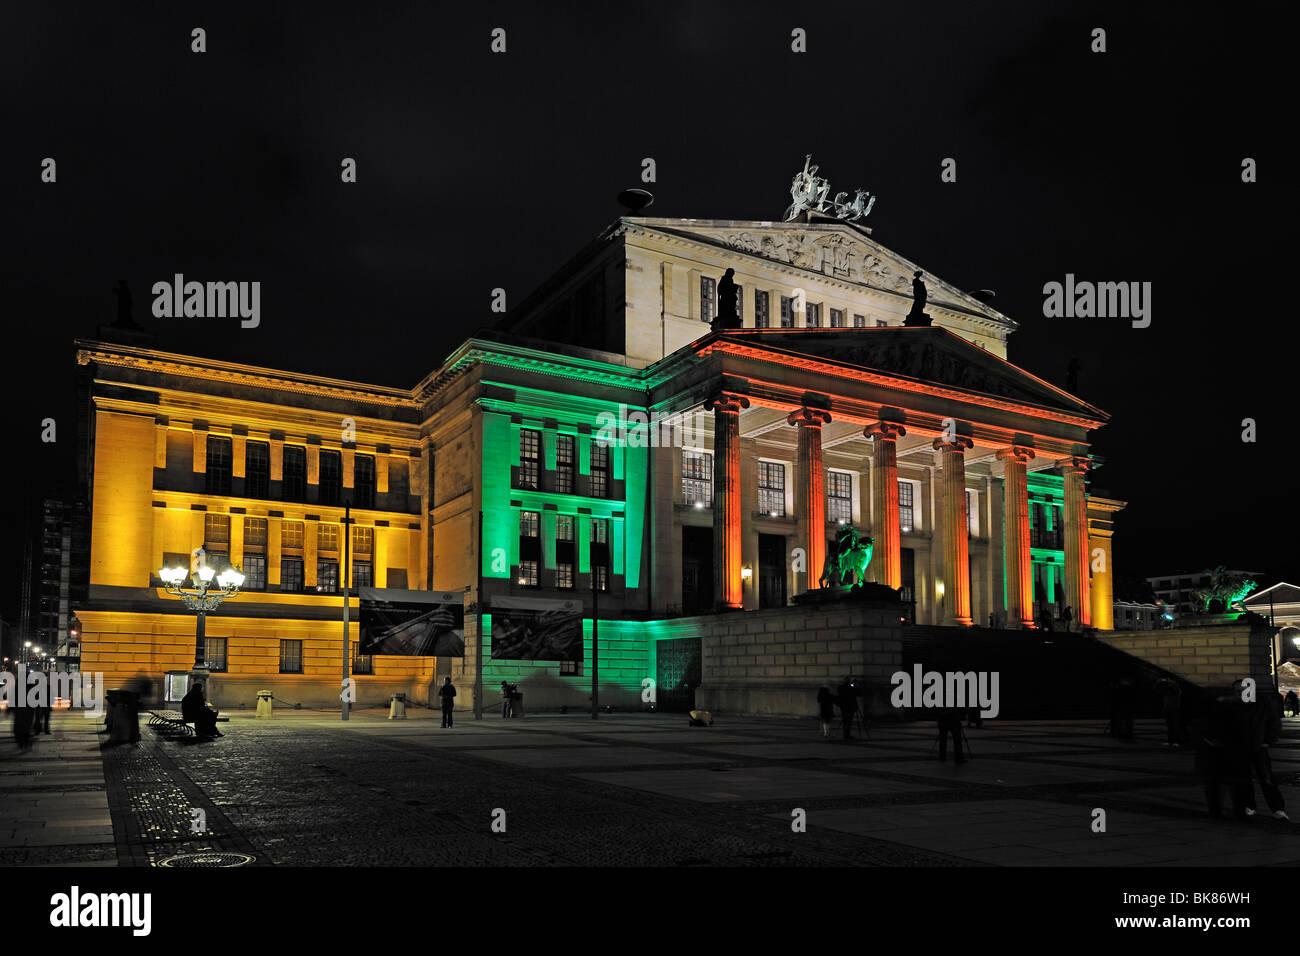 Konzerthaus, Concert Hall, Gendarmenmarkt square, illuminated, Festival of Lights 2009, Berlin, Germany, Europe - Stock Image